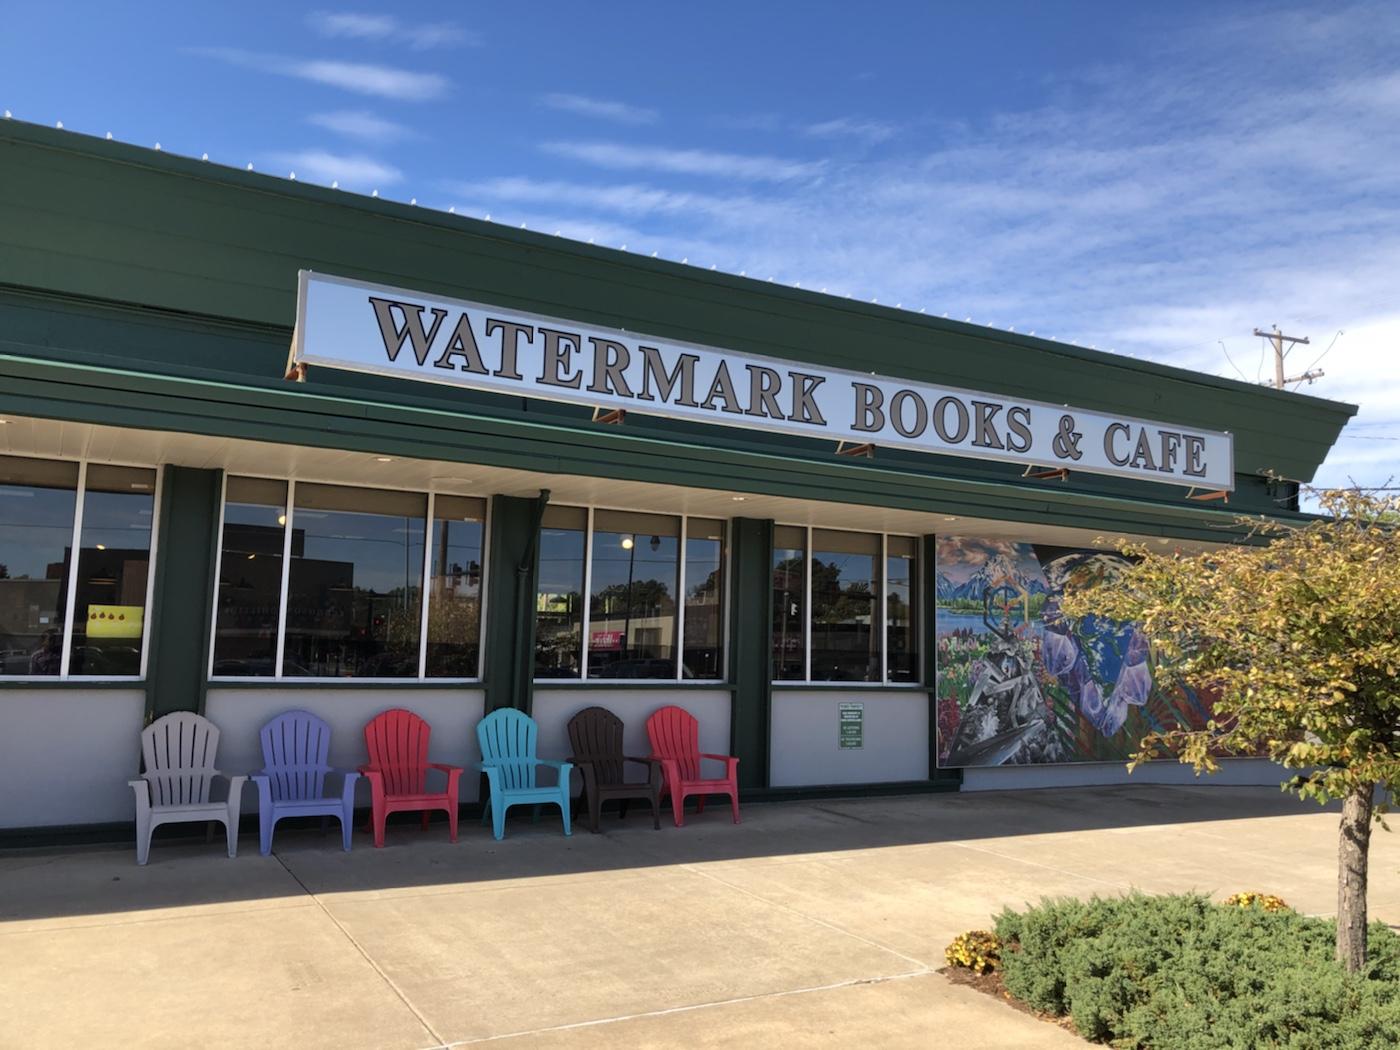 Watermark Books & Cafe